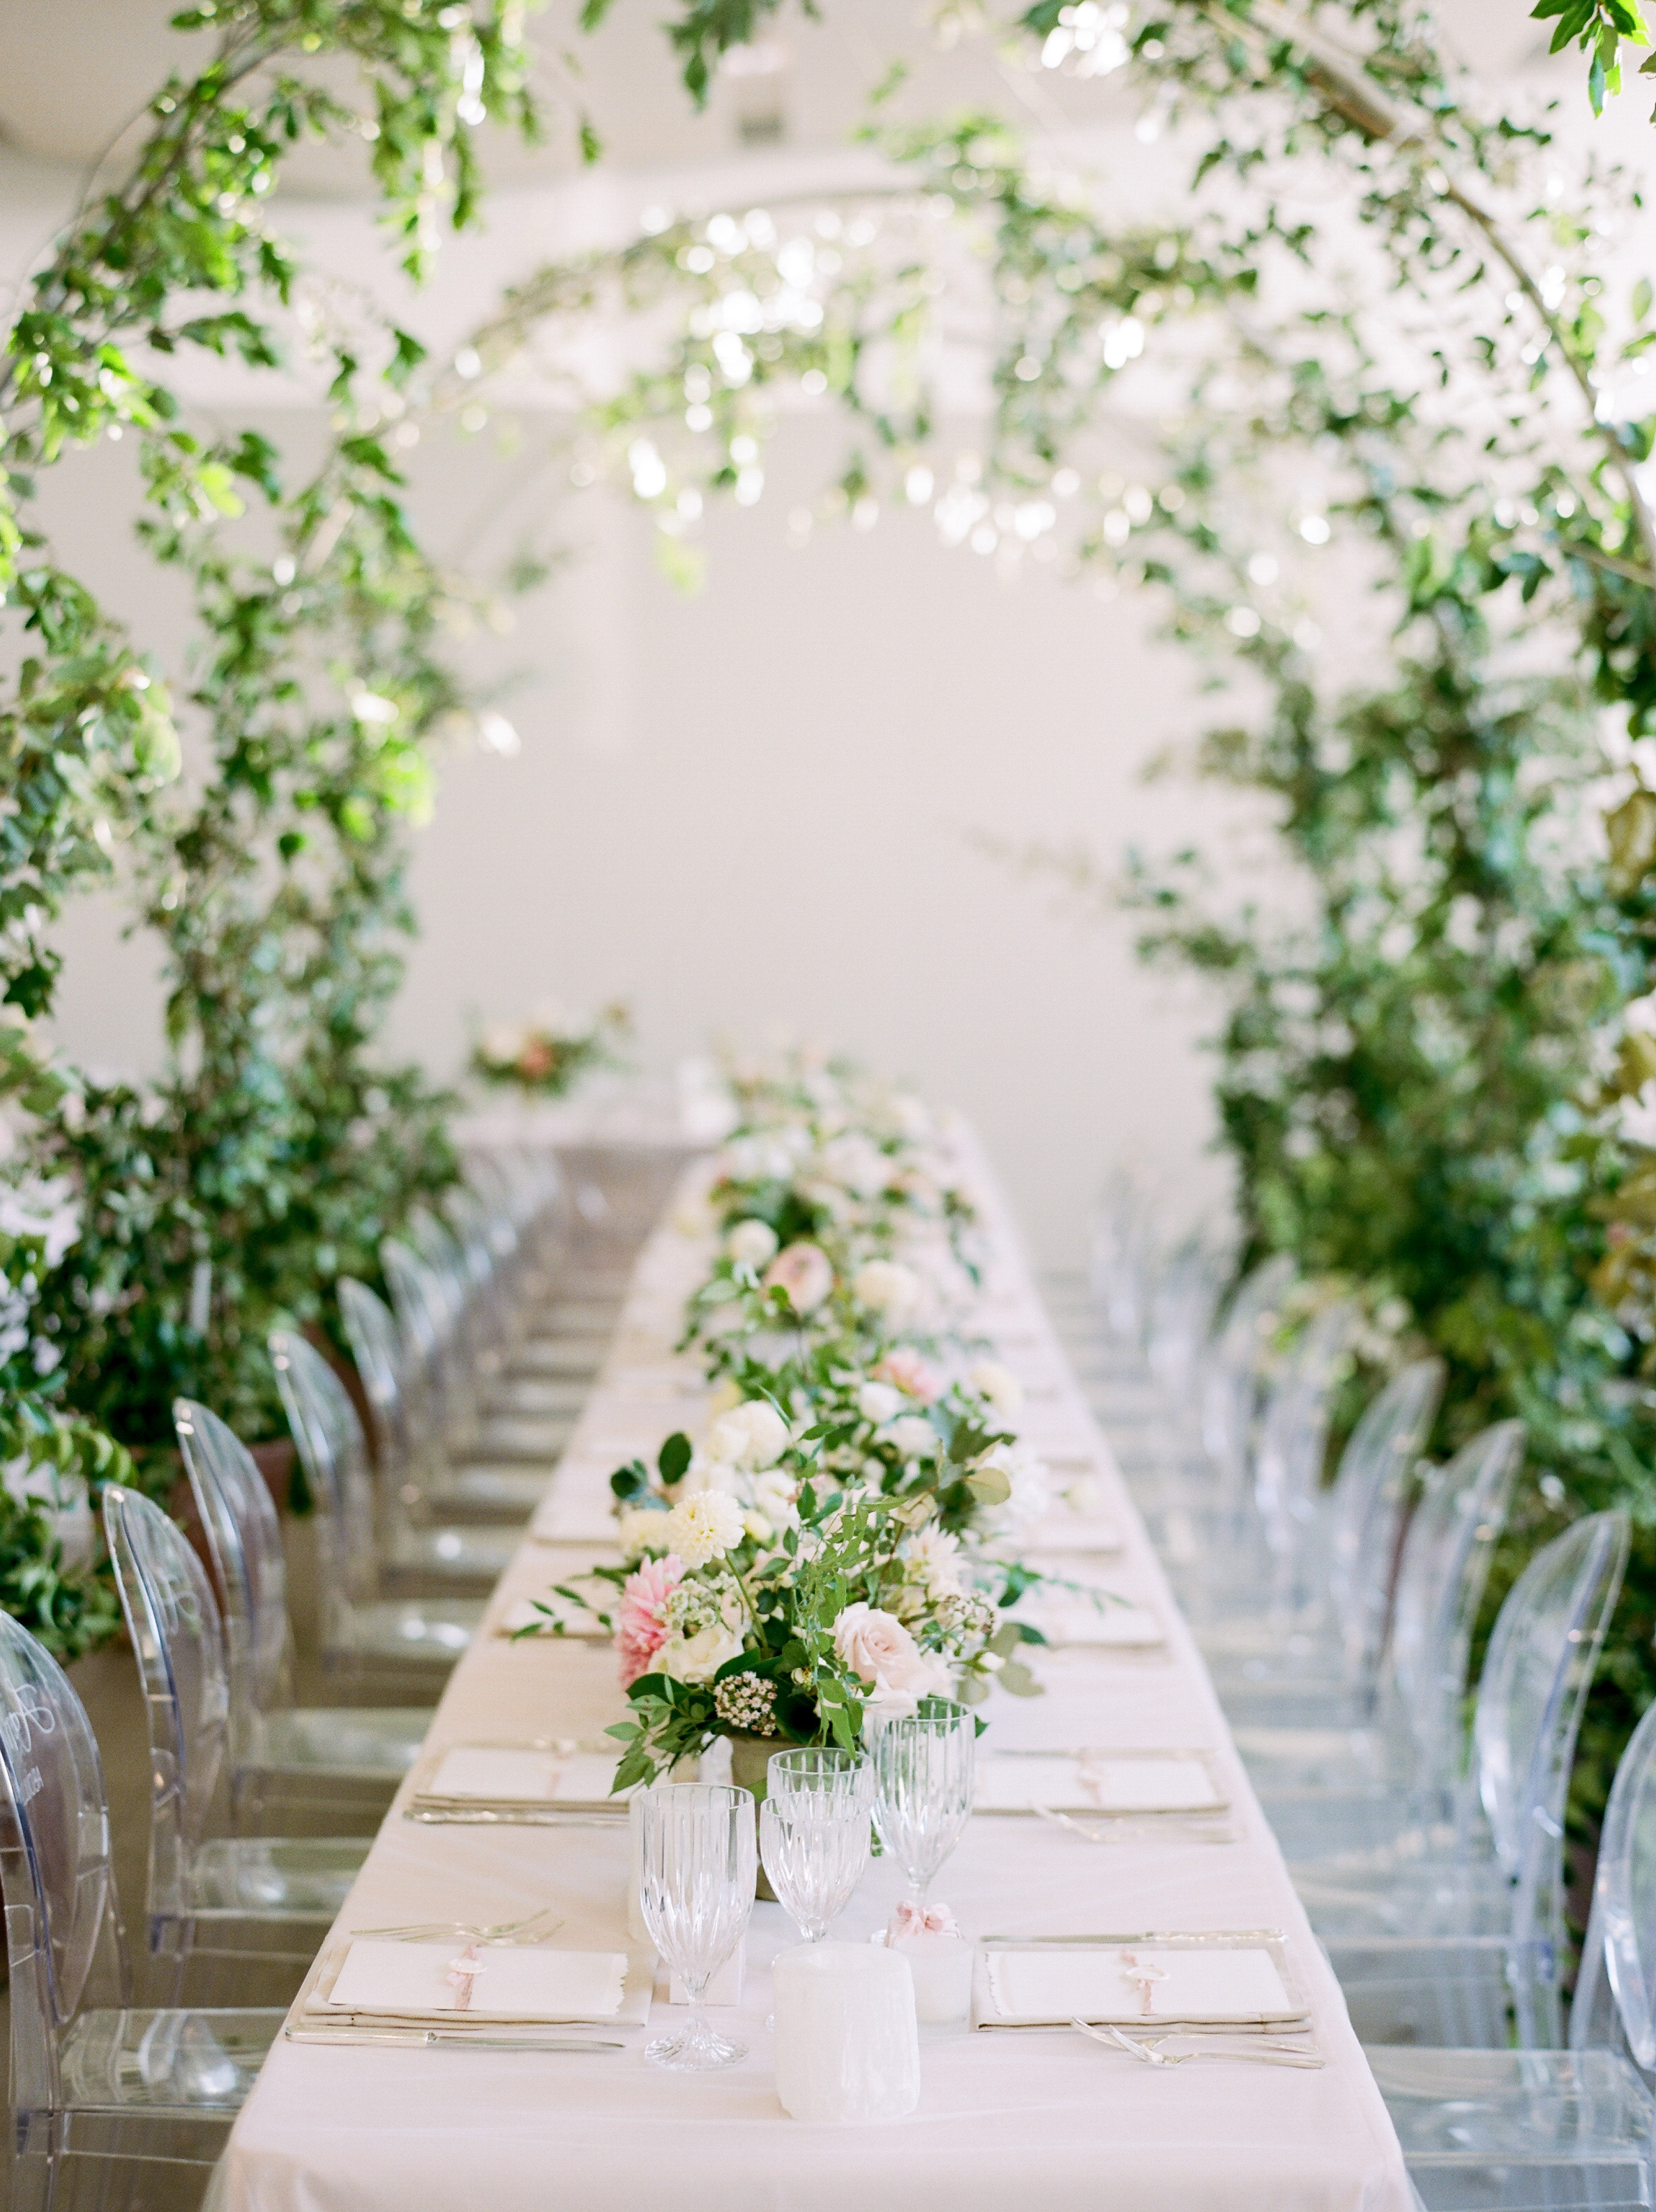 Martha-Stewart-Wedding-Dana-Fernandez-Photography-Josh-Texas-Film-Houston-Wedding-Fine-Art-Photographer-McGovern-Centennial-Gardens-Top-Best-46.jpg